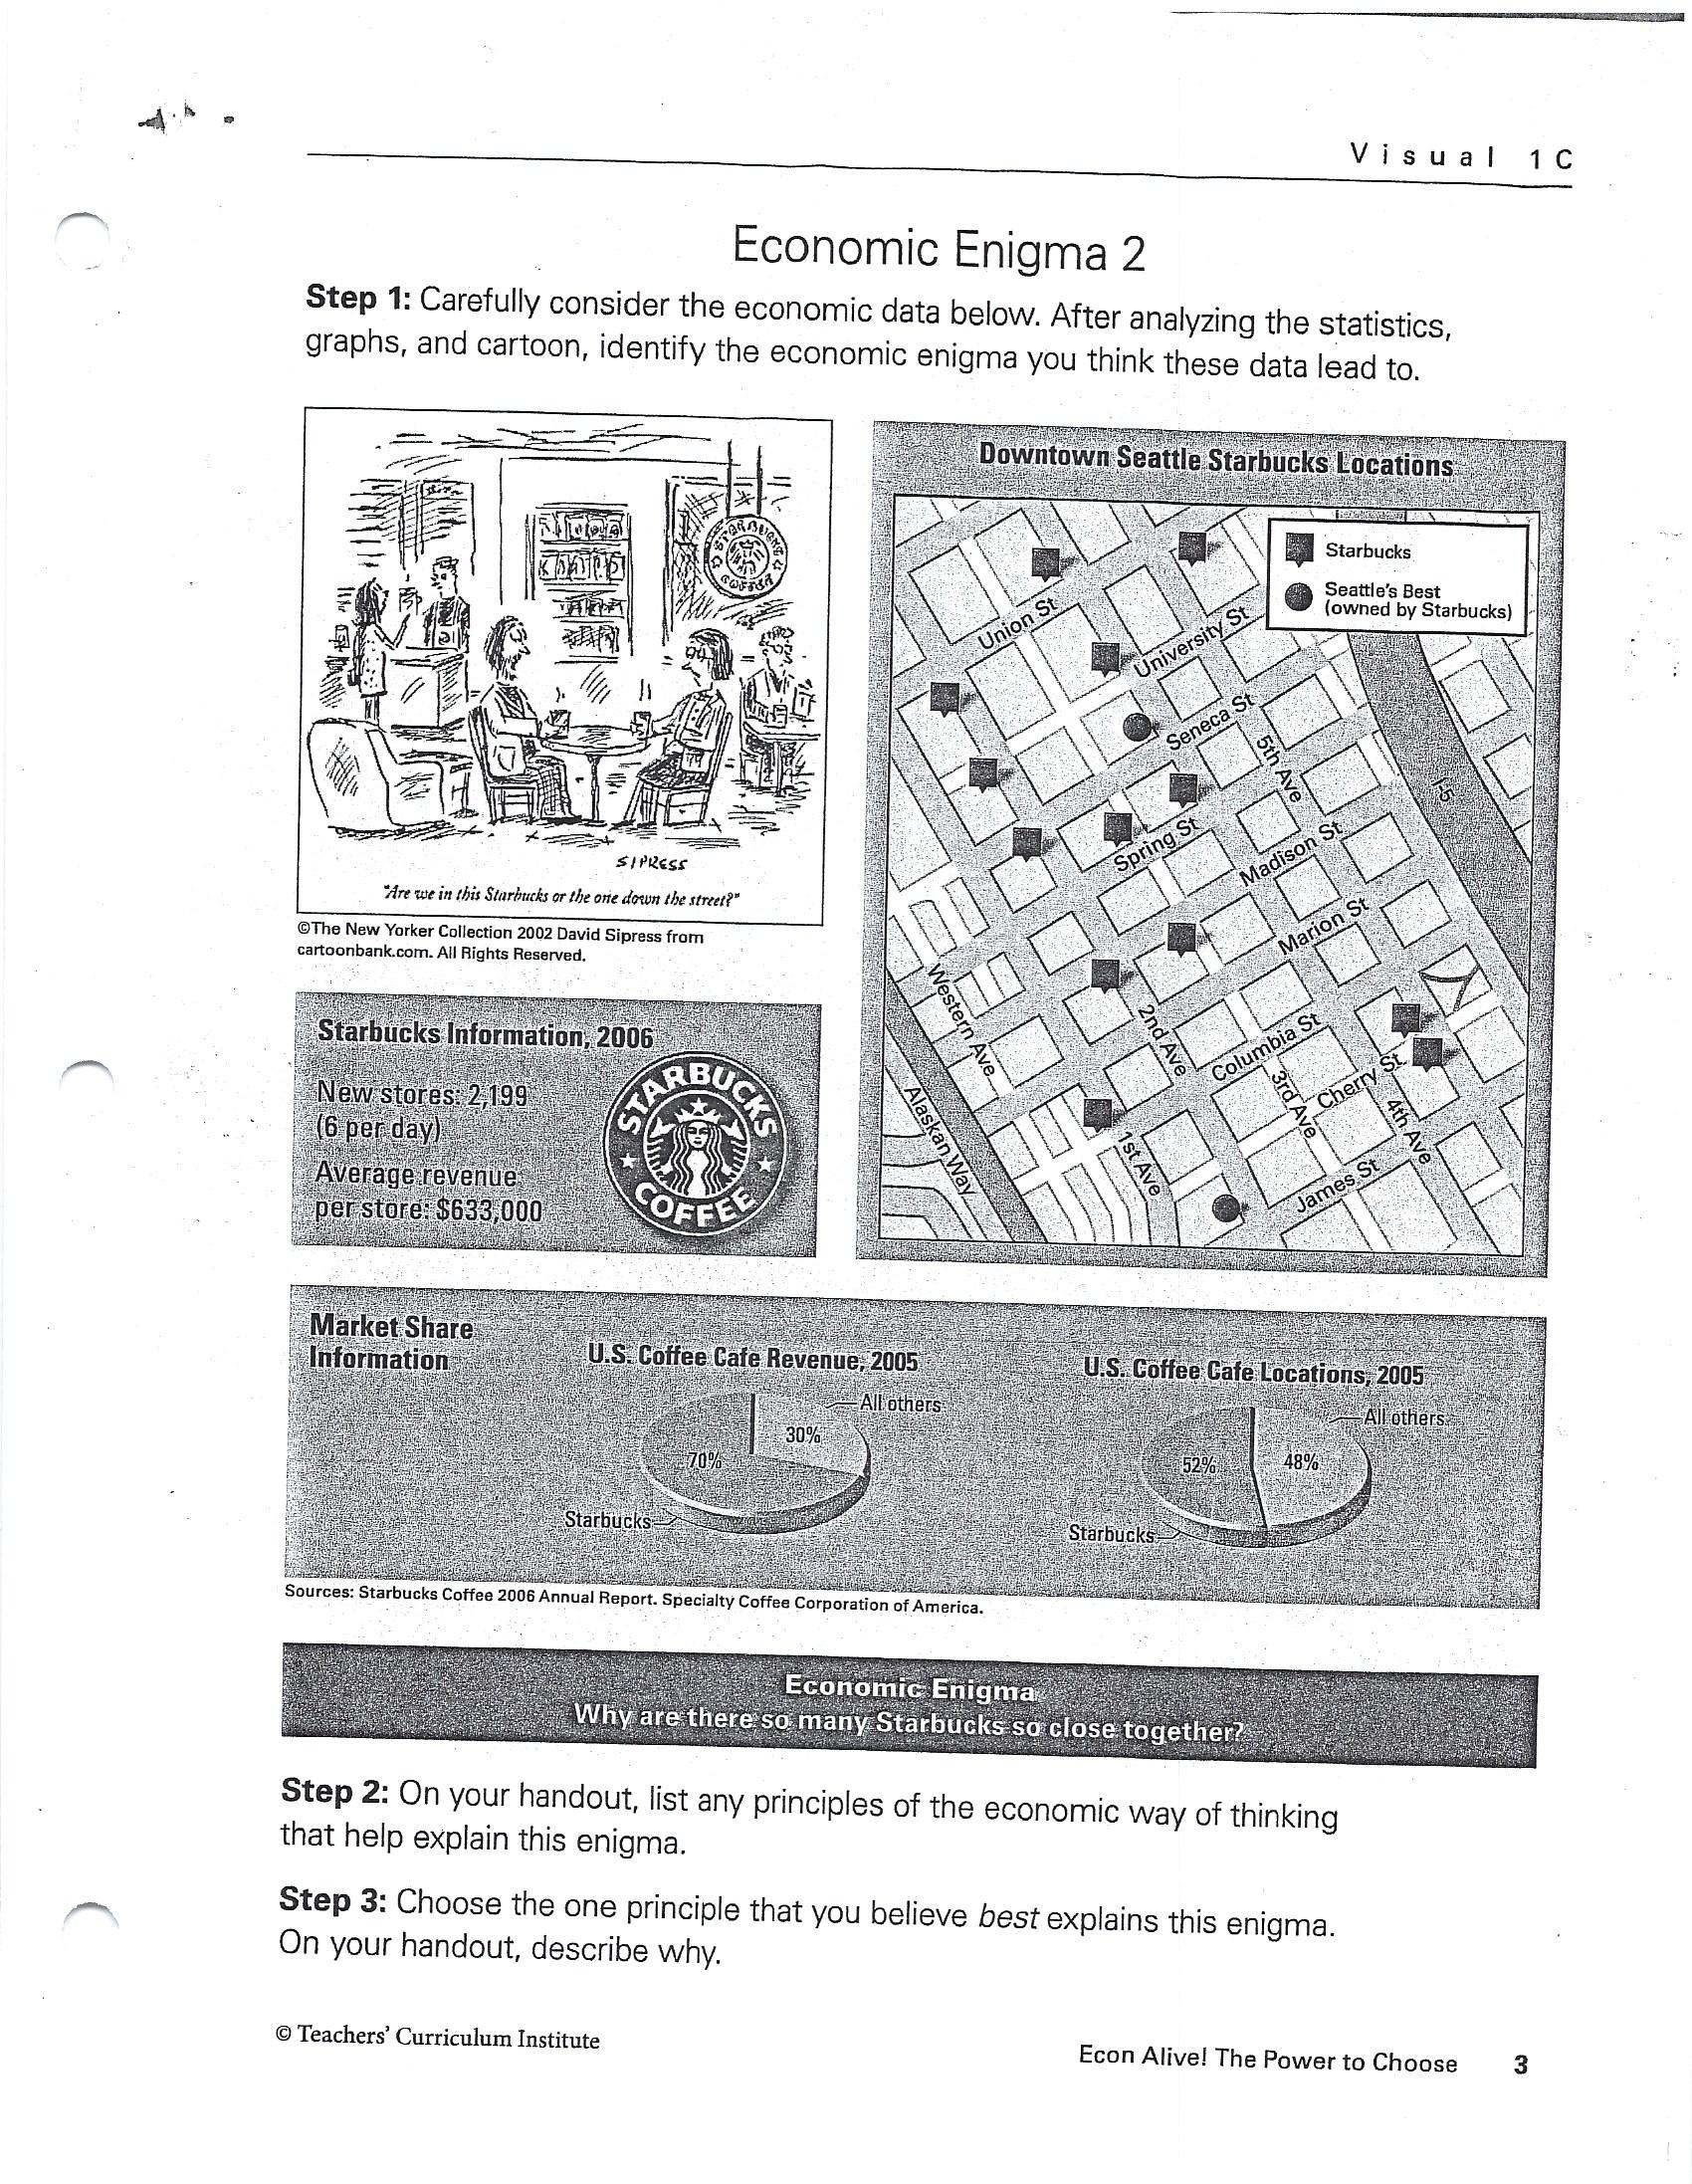 worksheet Freakonomics Movie Worksheet armani brenda social science what we did in economics class examining enigmas enigma 1